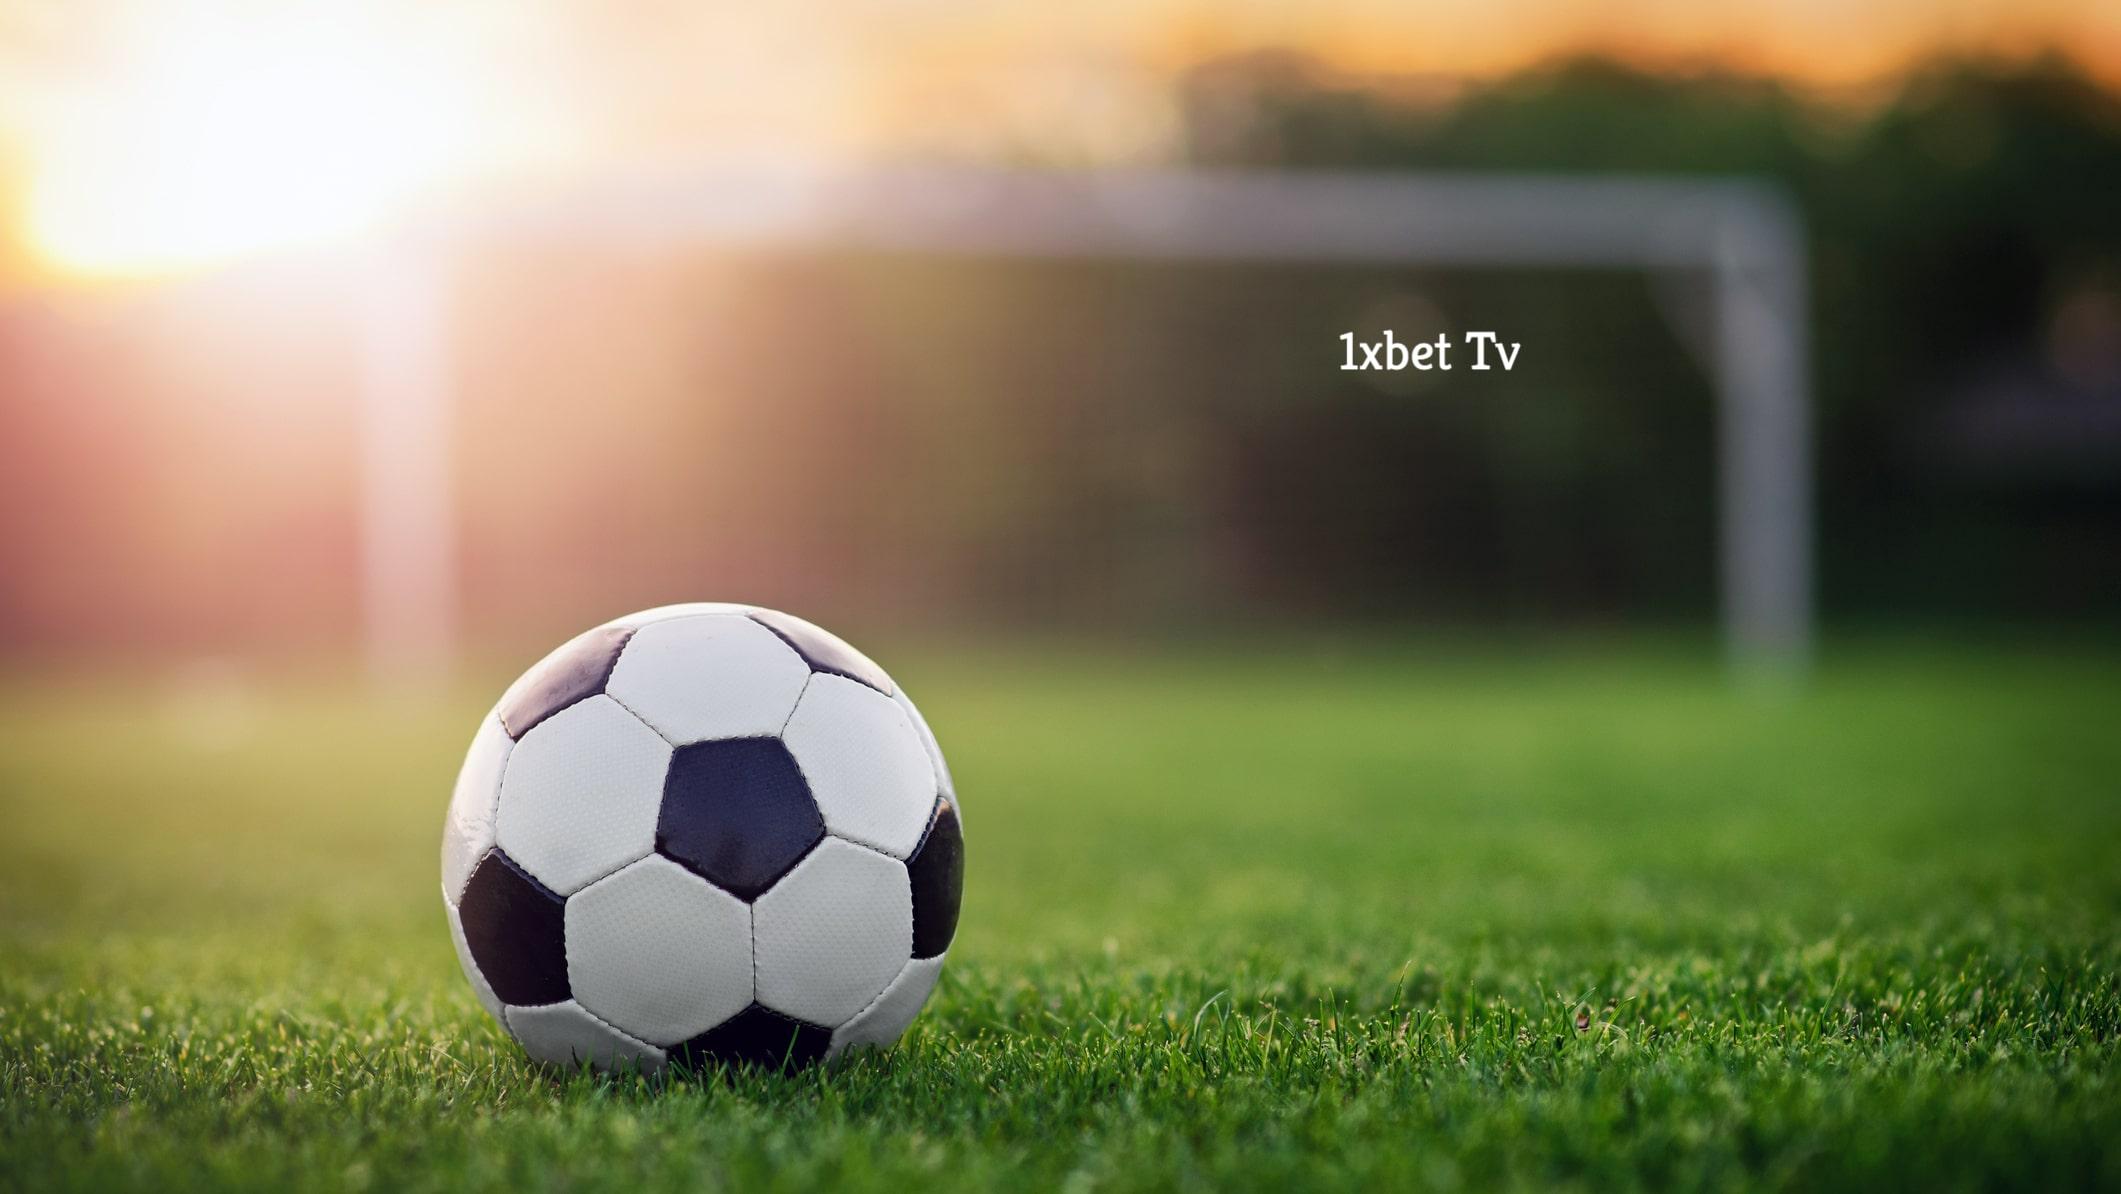 1xbet Tv